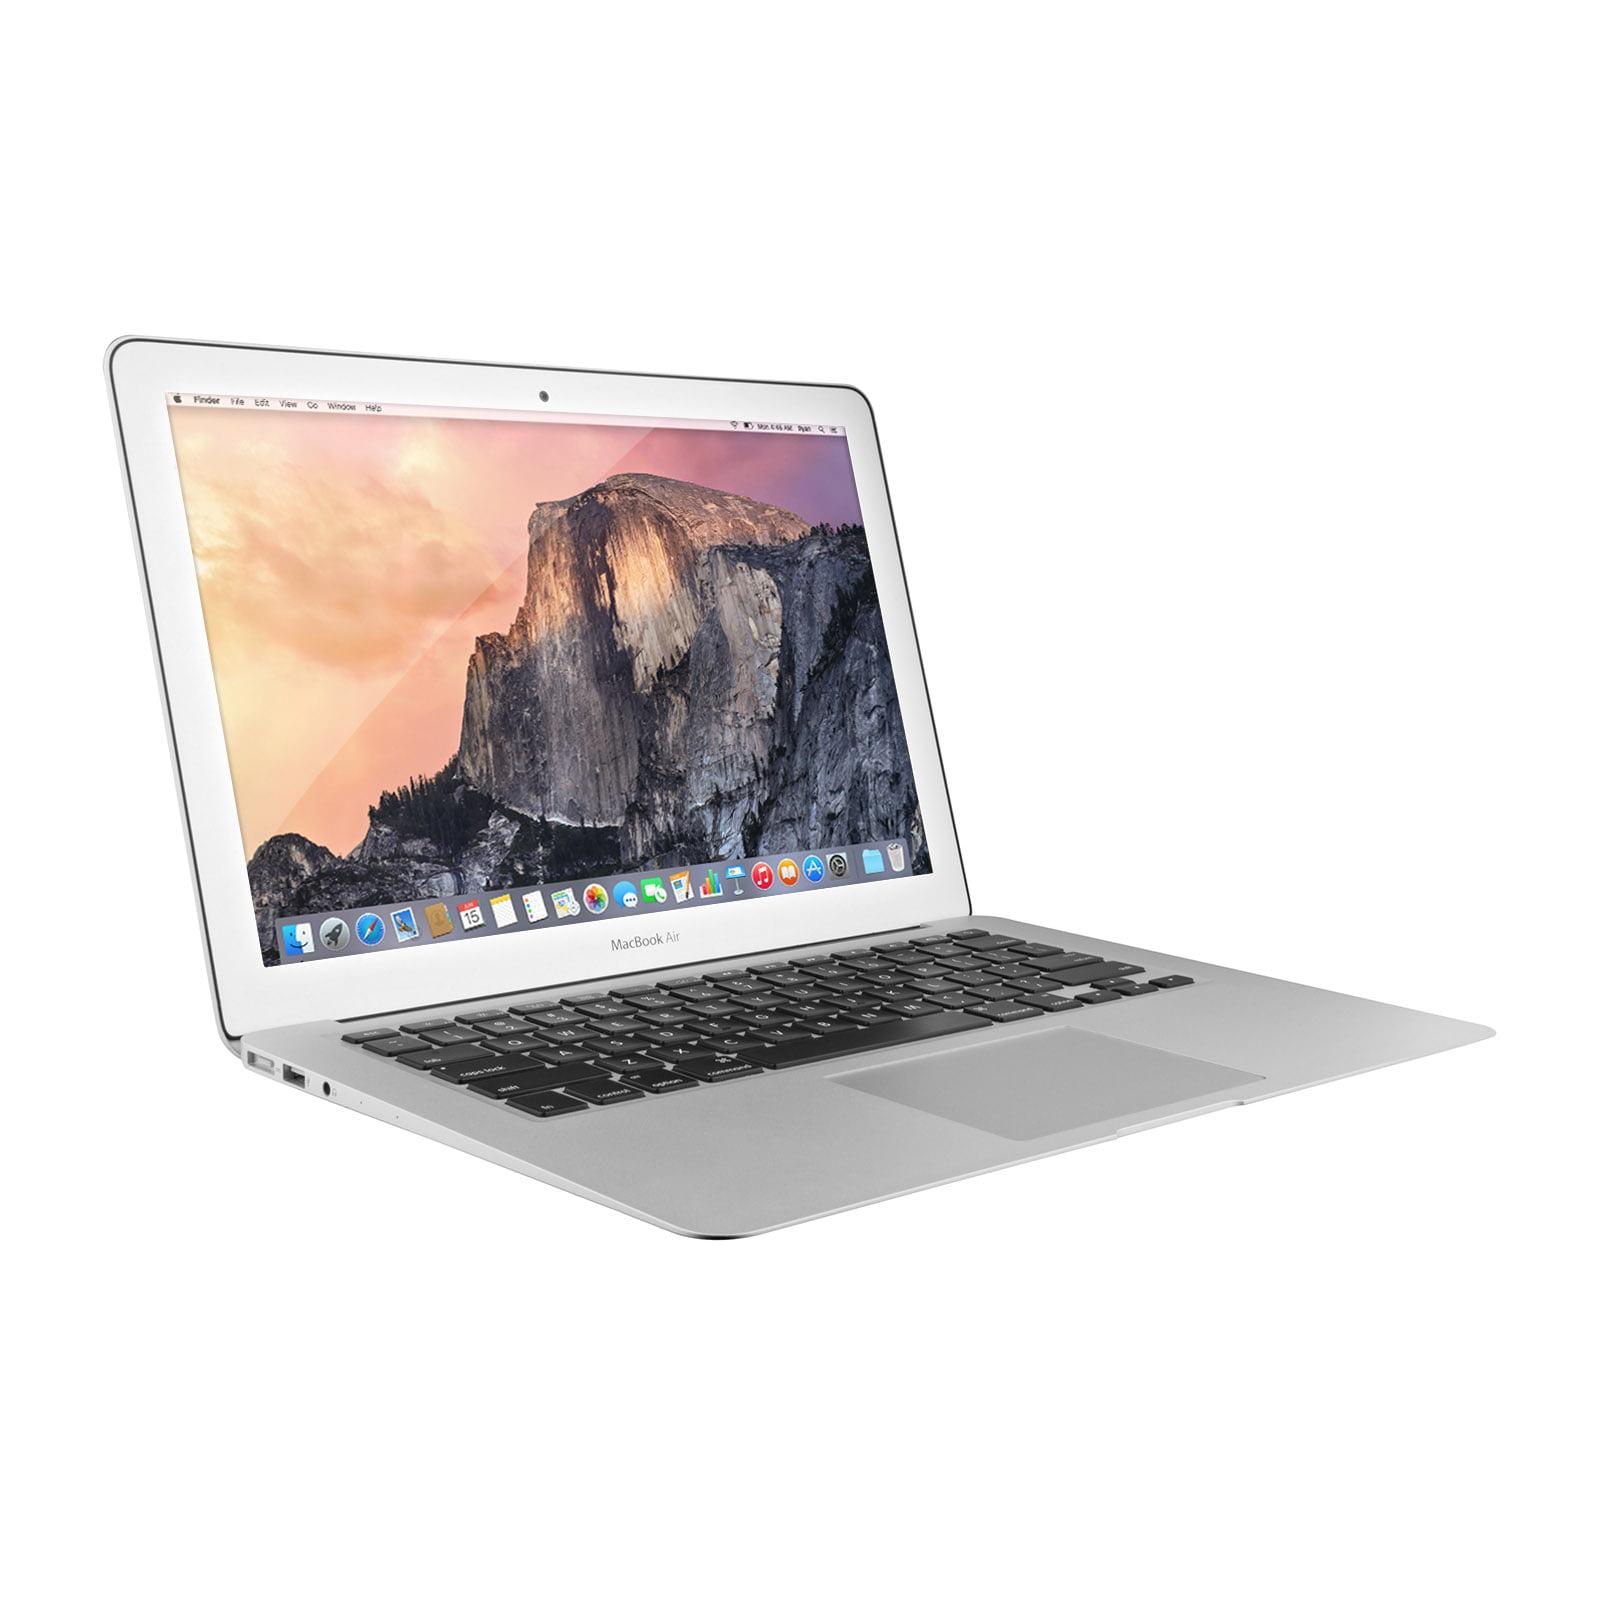 "Apple MacBook Air 13.3"" Laptop (MD760LLB) Gray"